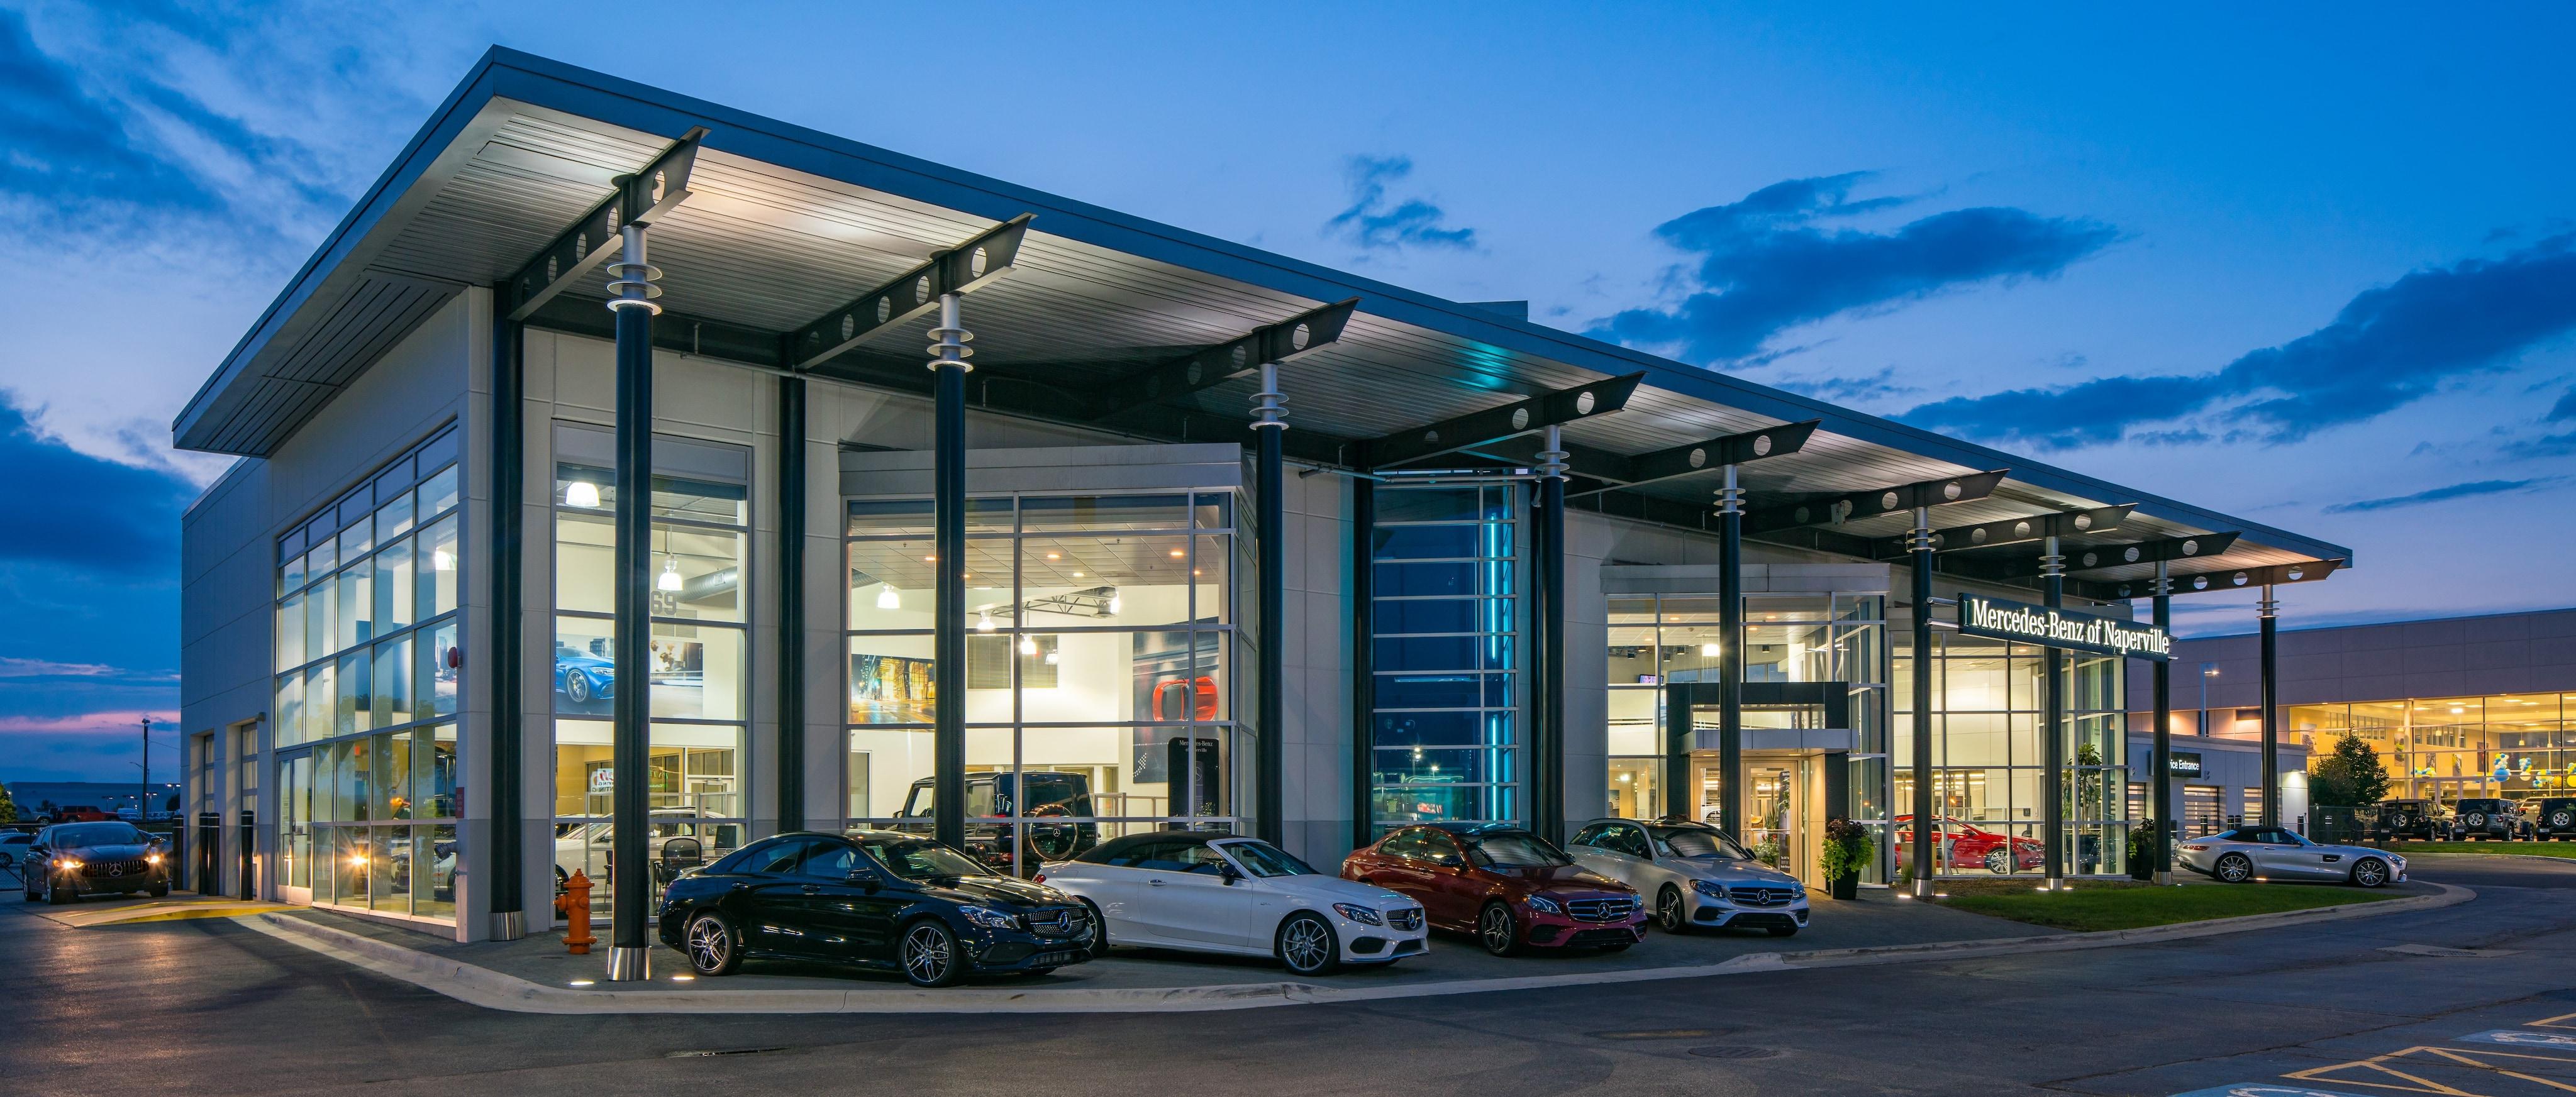 About Mercedes-Benz of Naperville   Your Premier ...